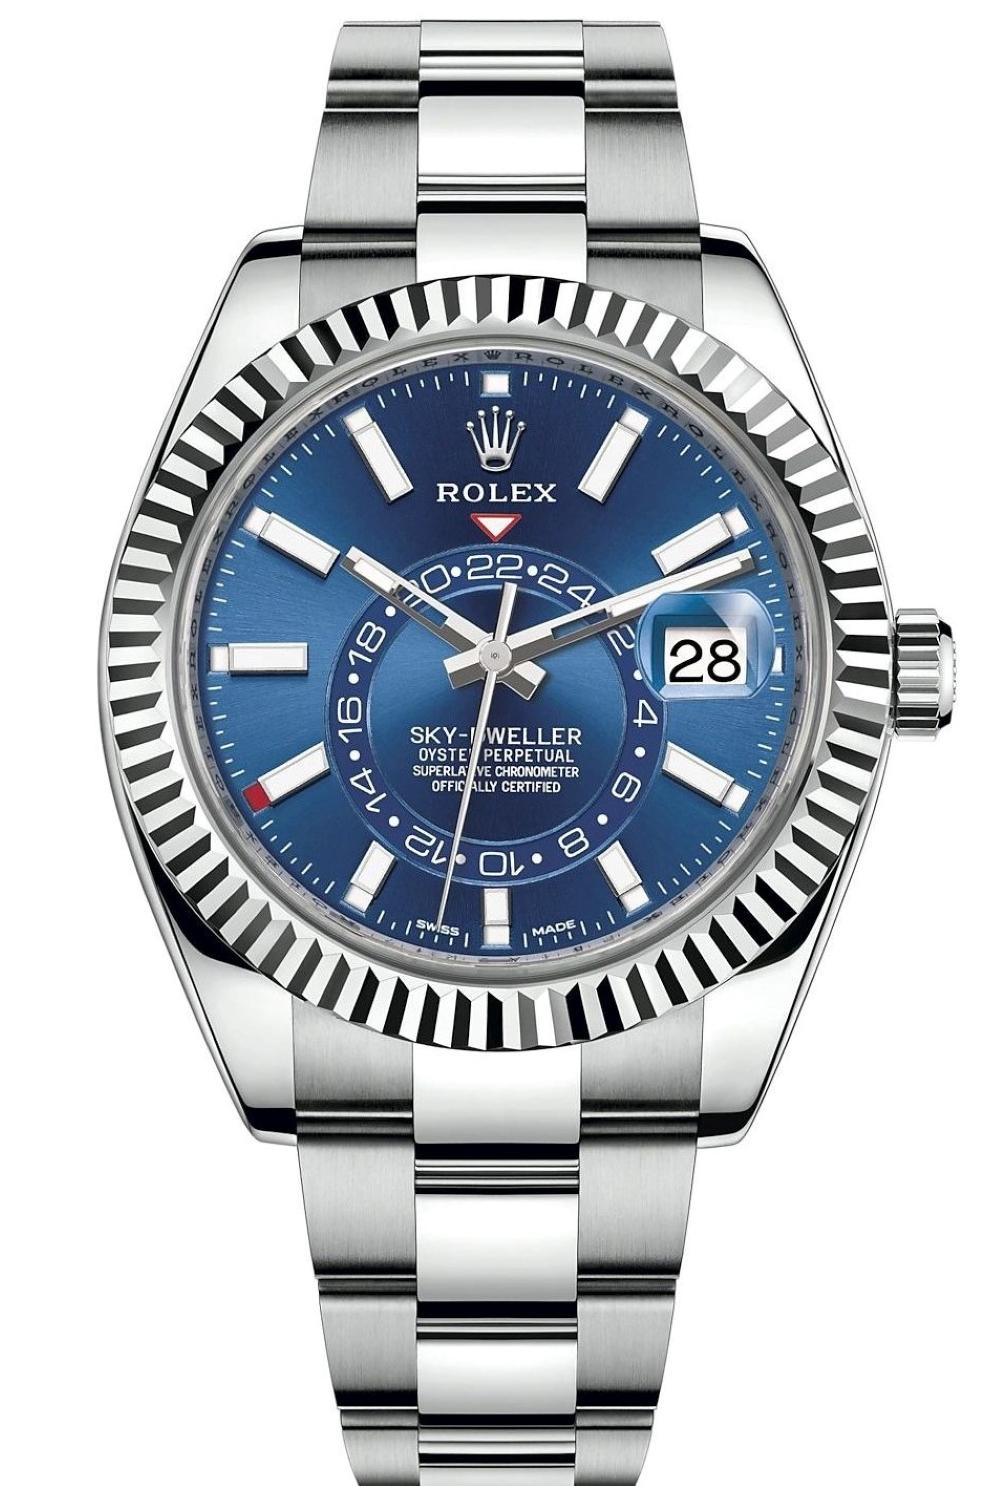 ROLEX SKY-DWELLER BLUE DIAL 42MM FULL SET REF: 326934